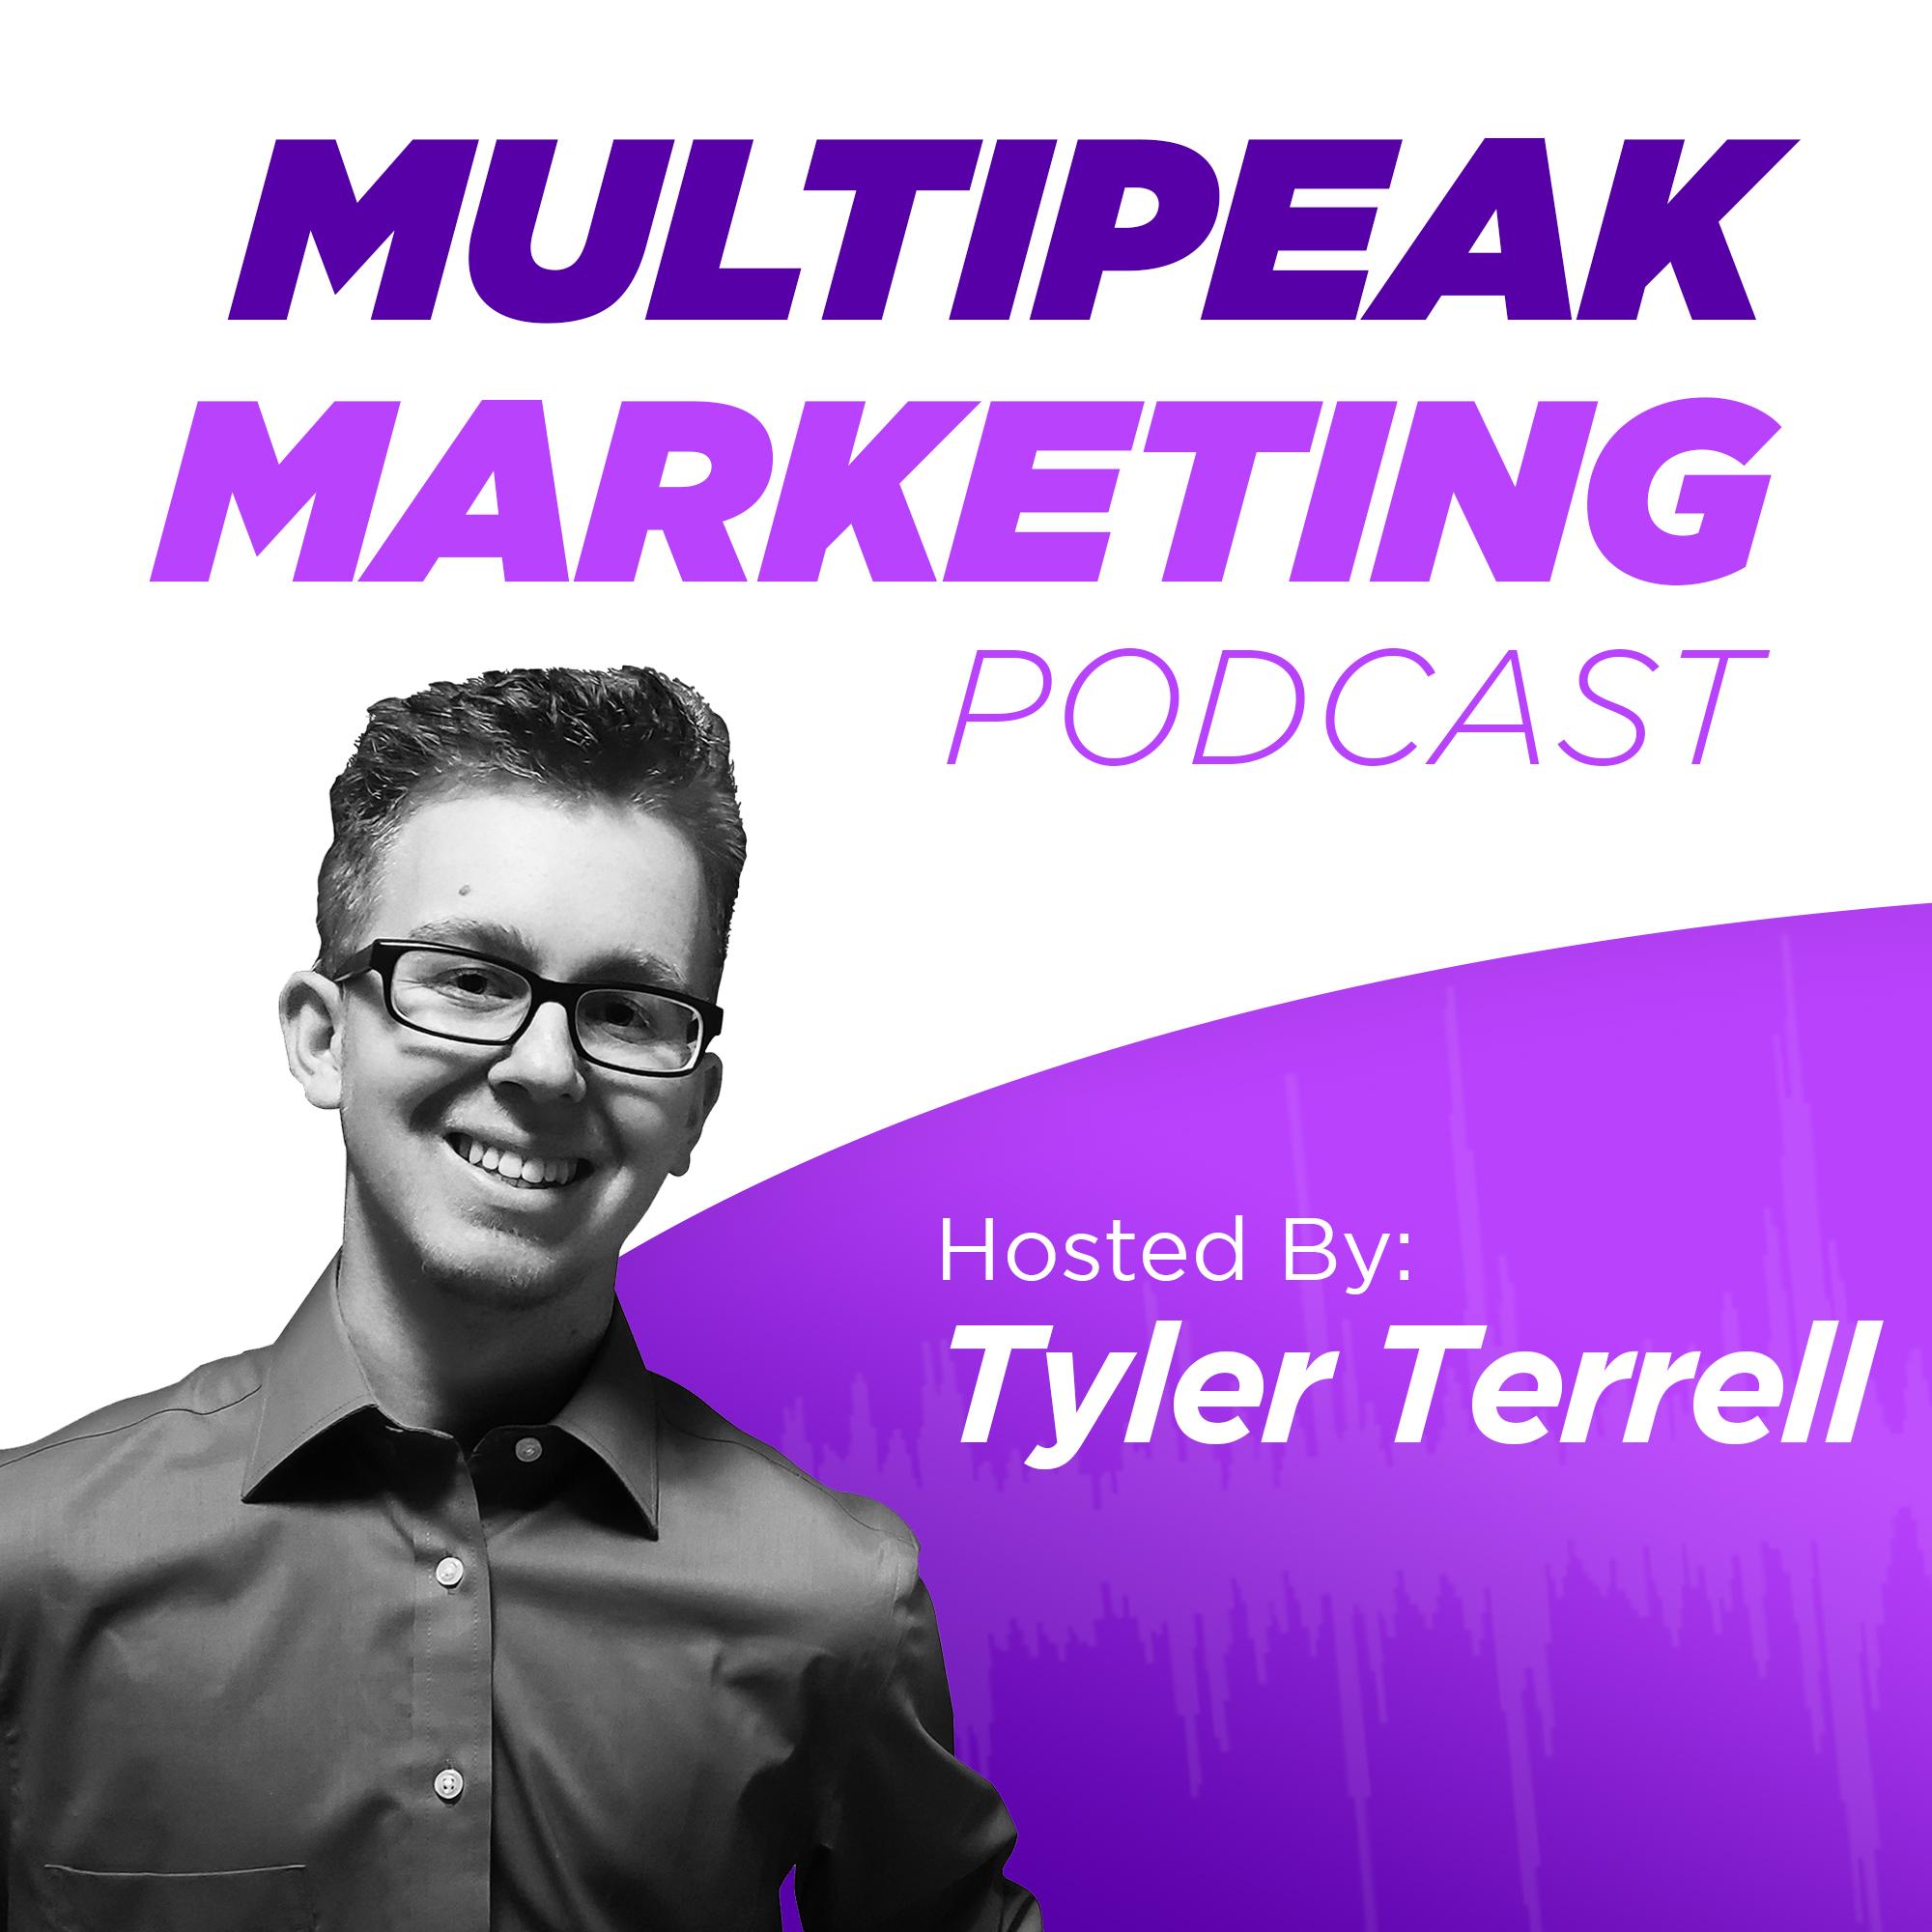 Dr. Krystian Jarosz - Multipeak Marketing Podcast - Episode 3 show art